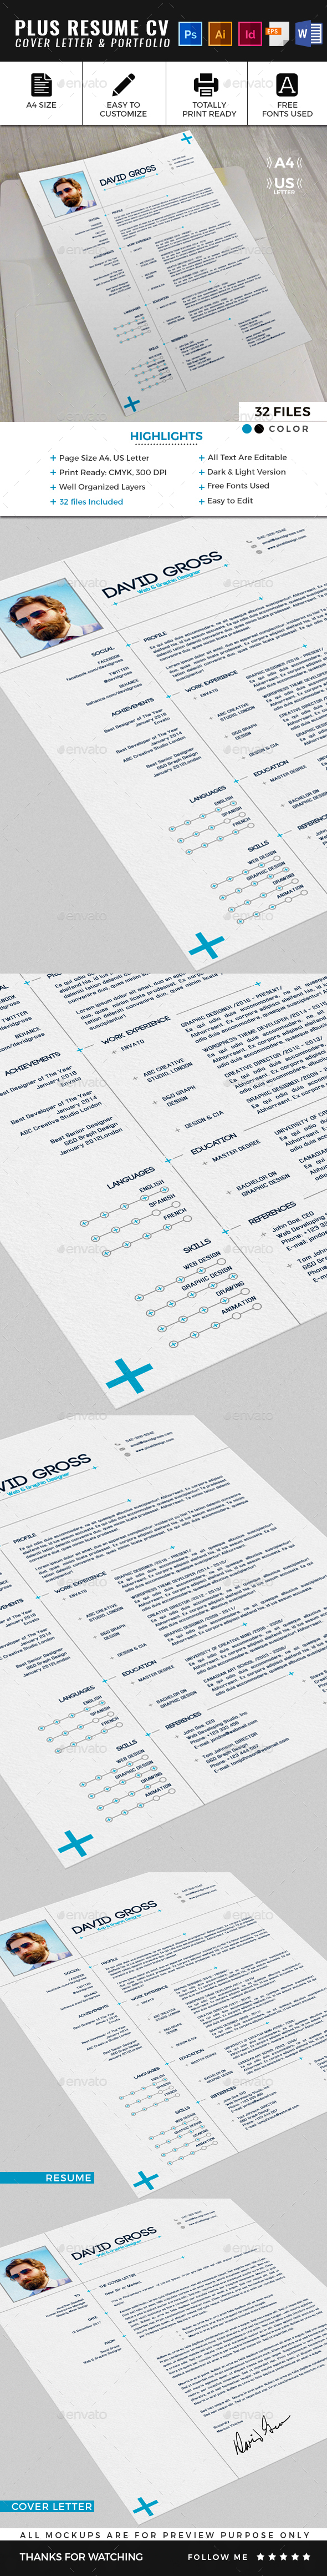 Plus Resume CV Template - Resumes Stationery